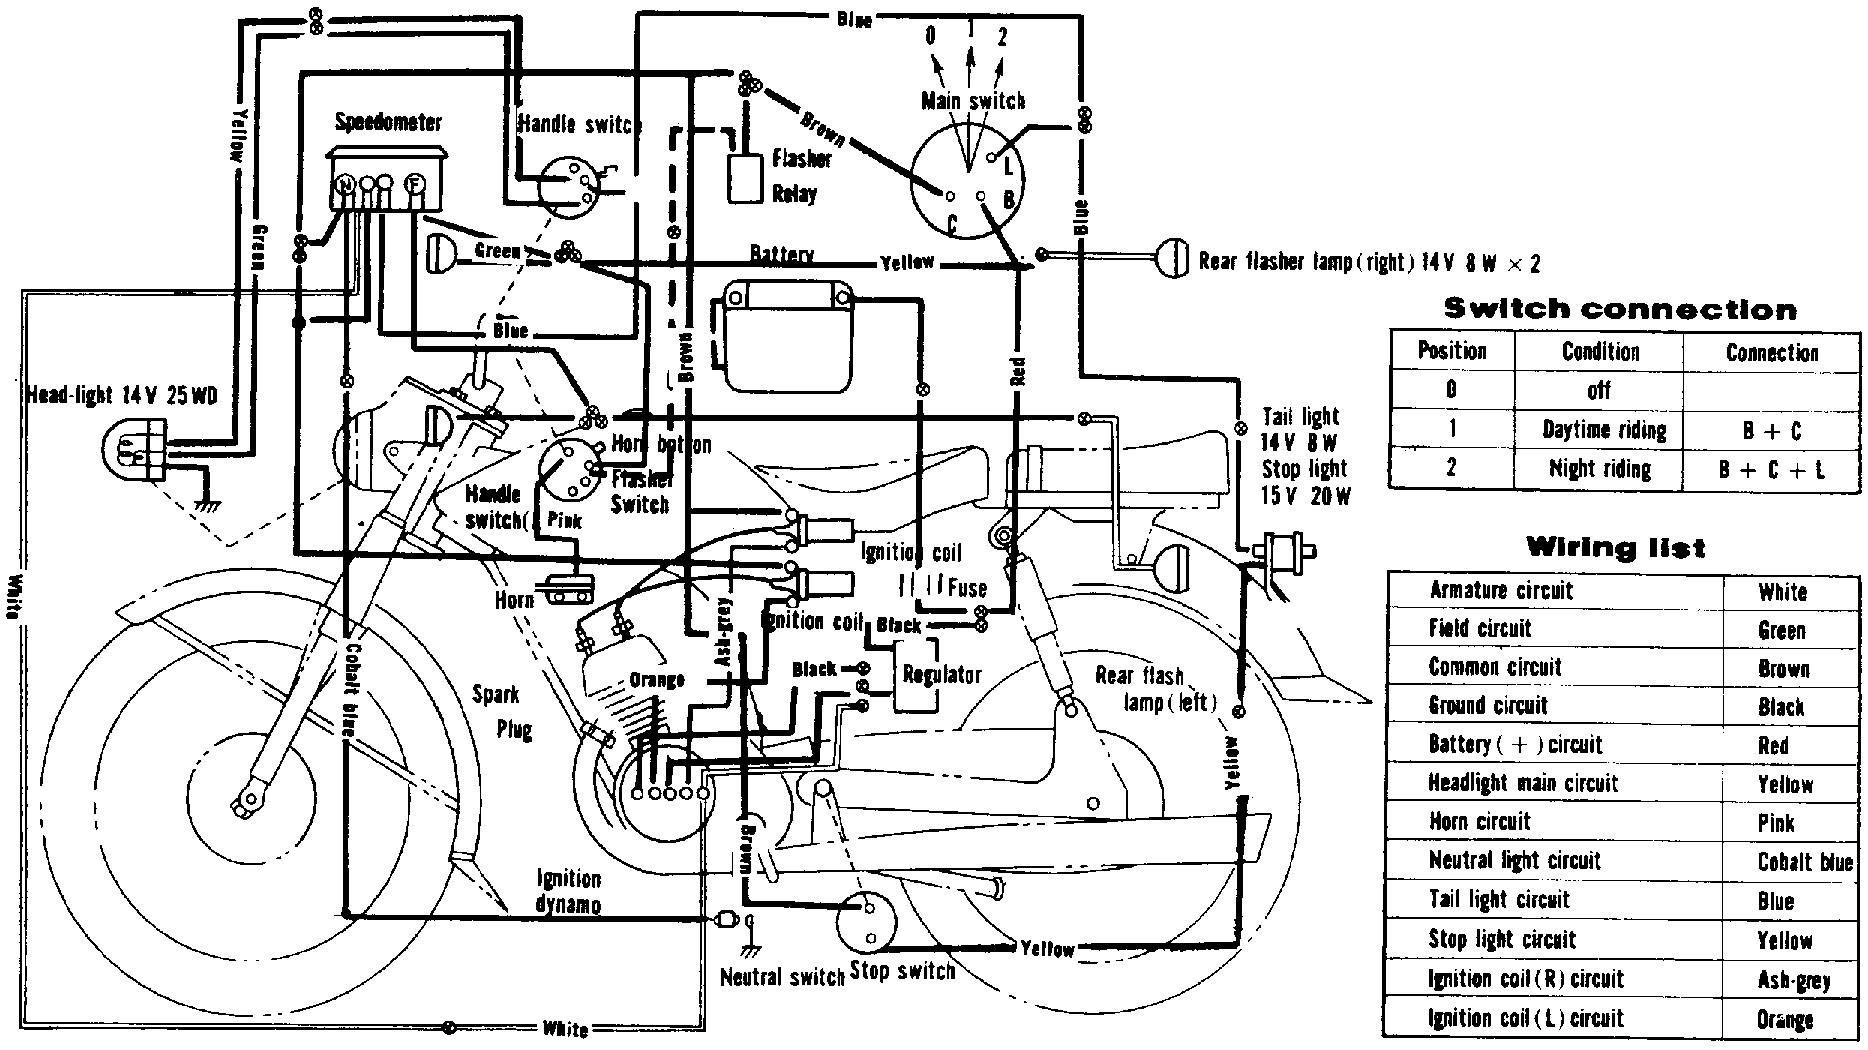 small resolution of yamaha l2 wiring diagram wiring diagrams for arctic cat wiring diagram yamaha l2 wiring diagram